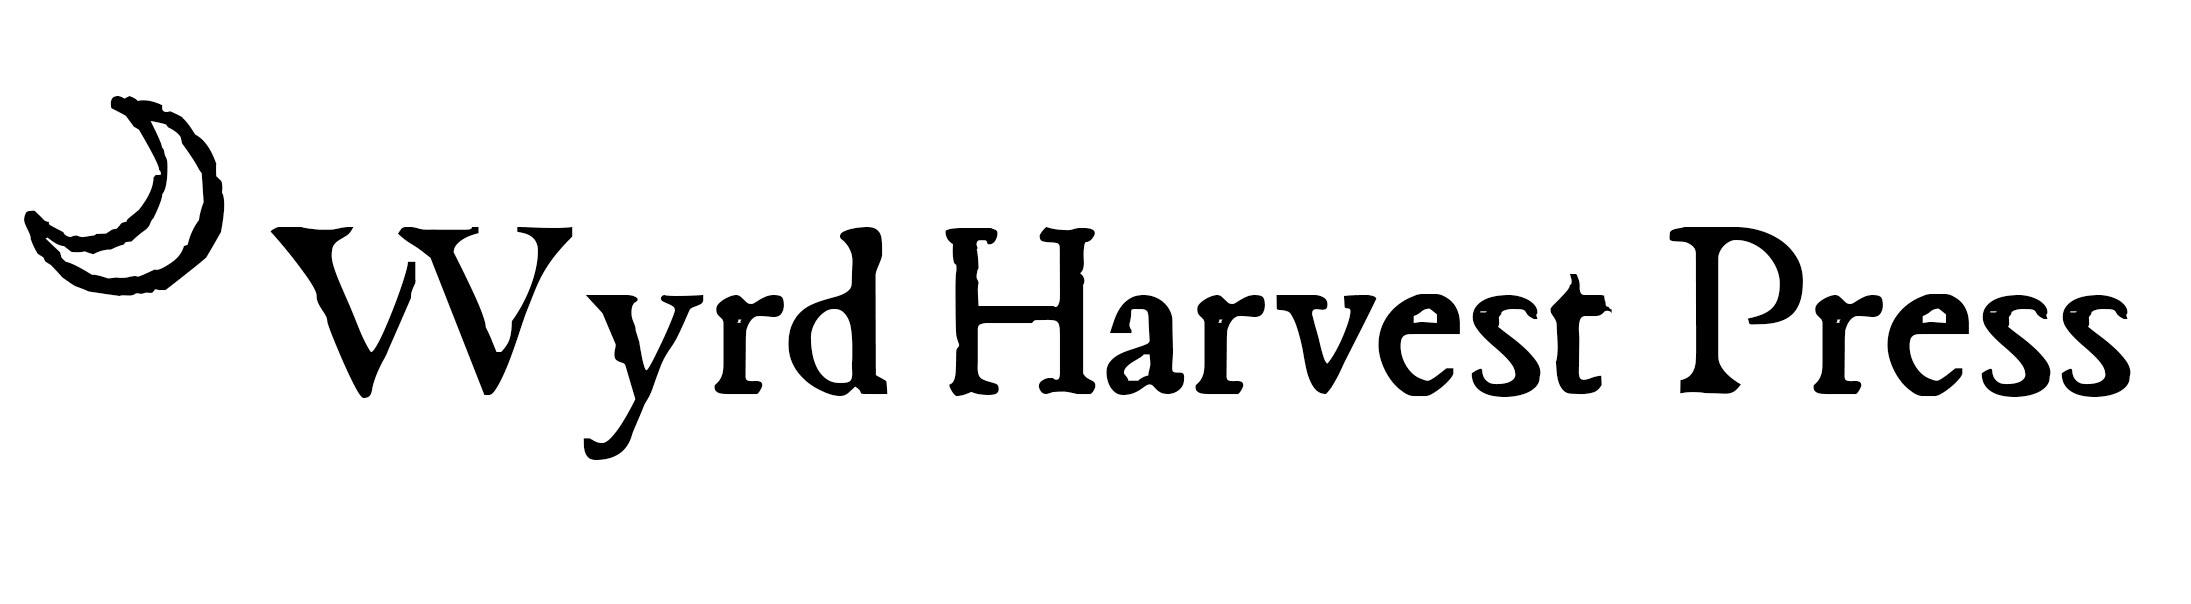 wyrd harvest logo.jpg